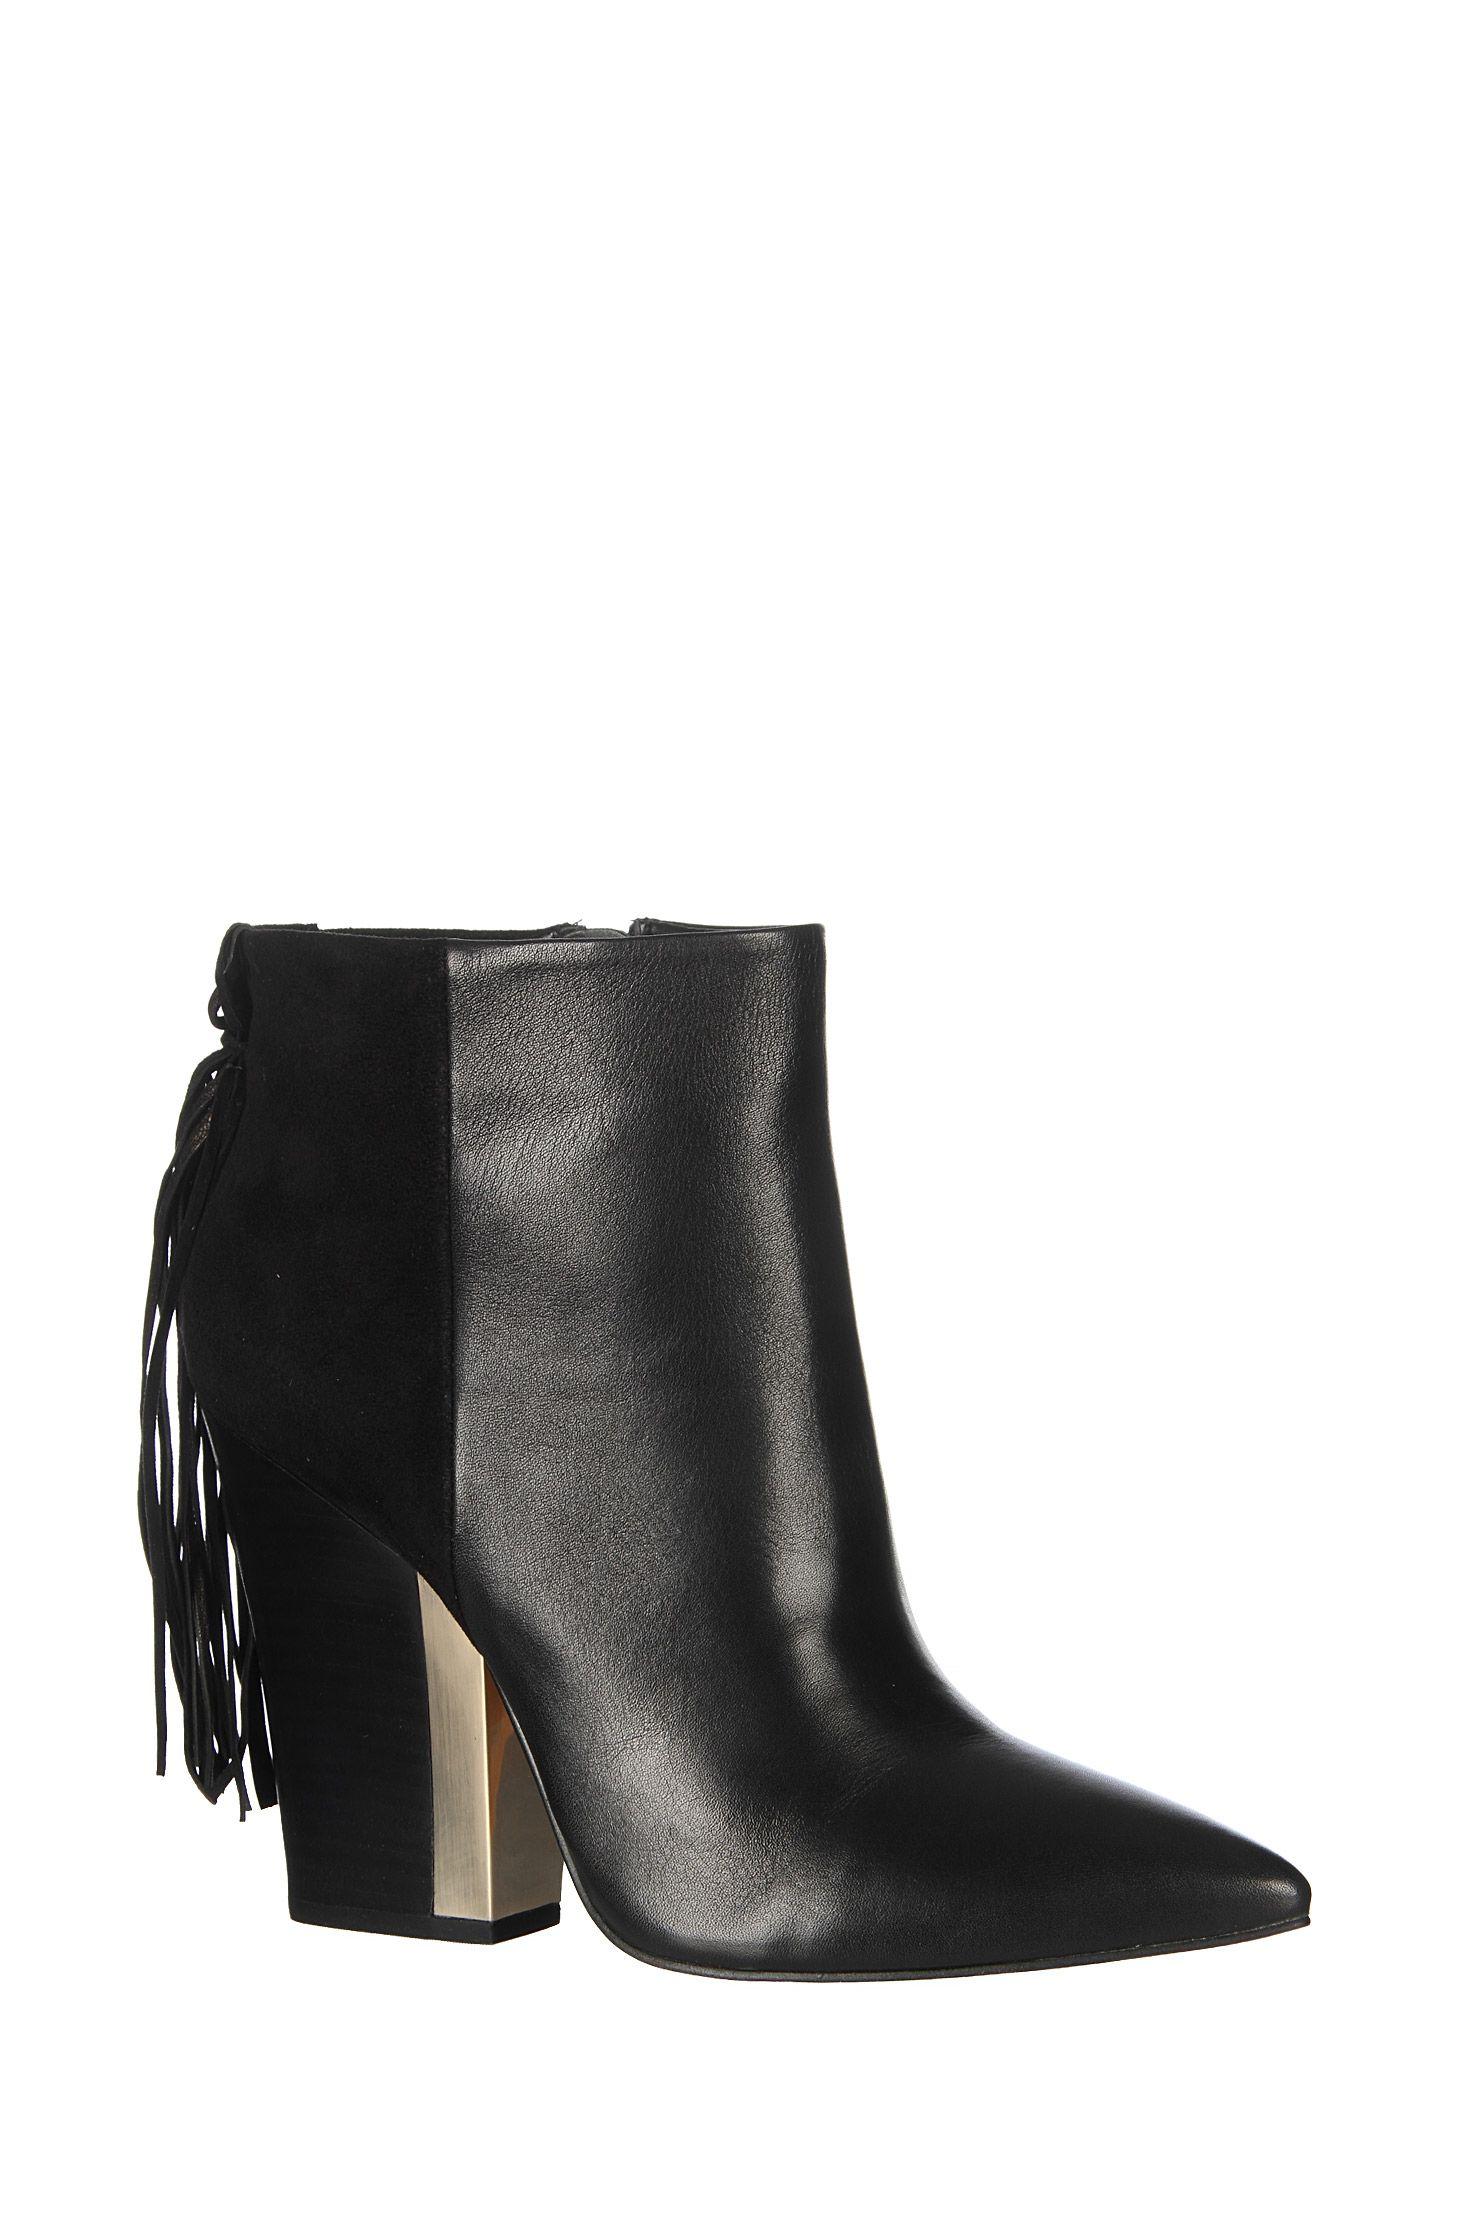 Sam Edelman Boots Mariel in Black